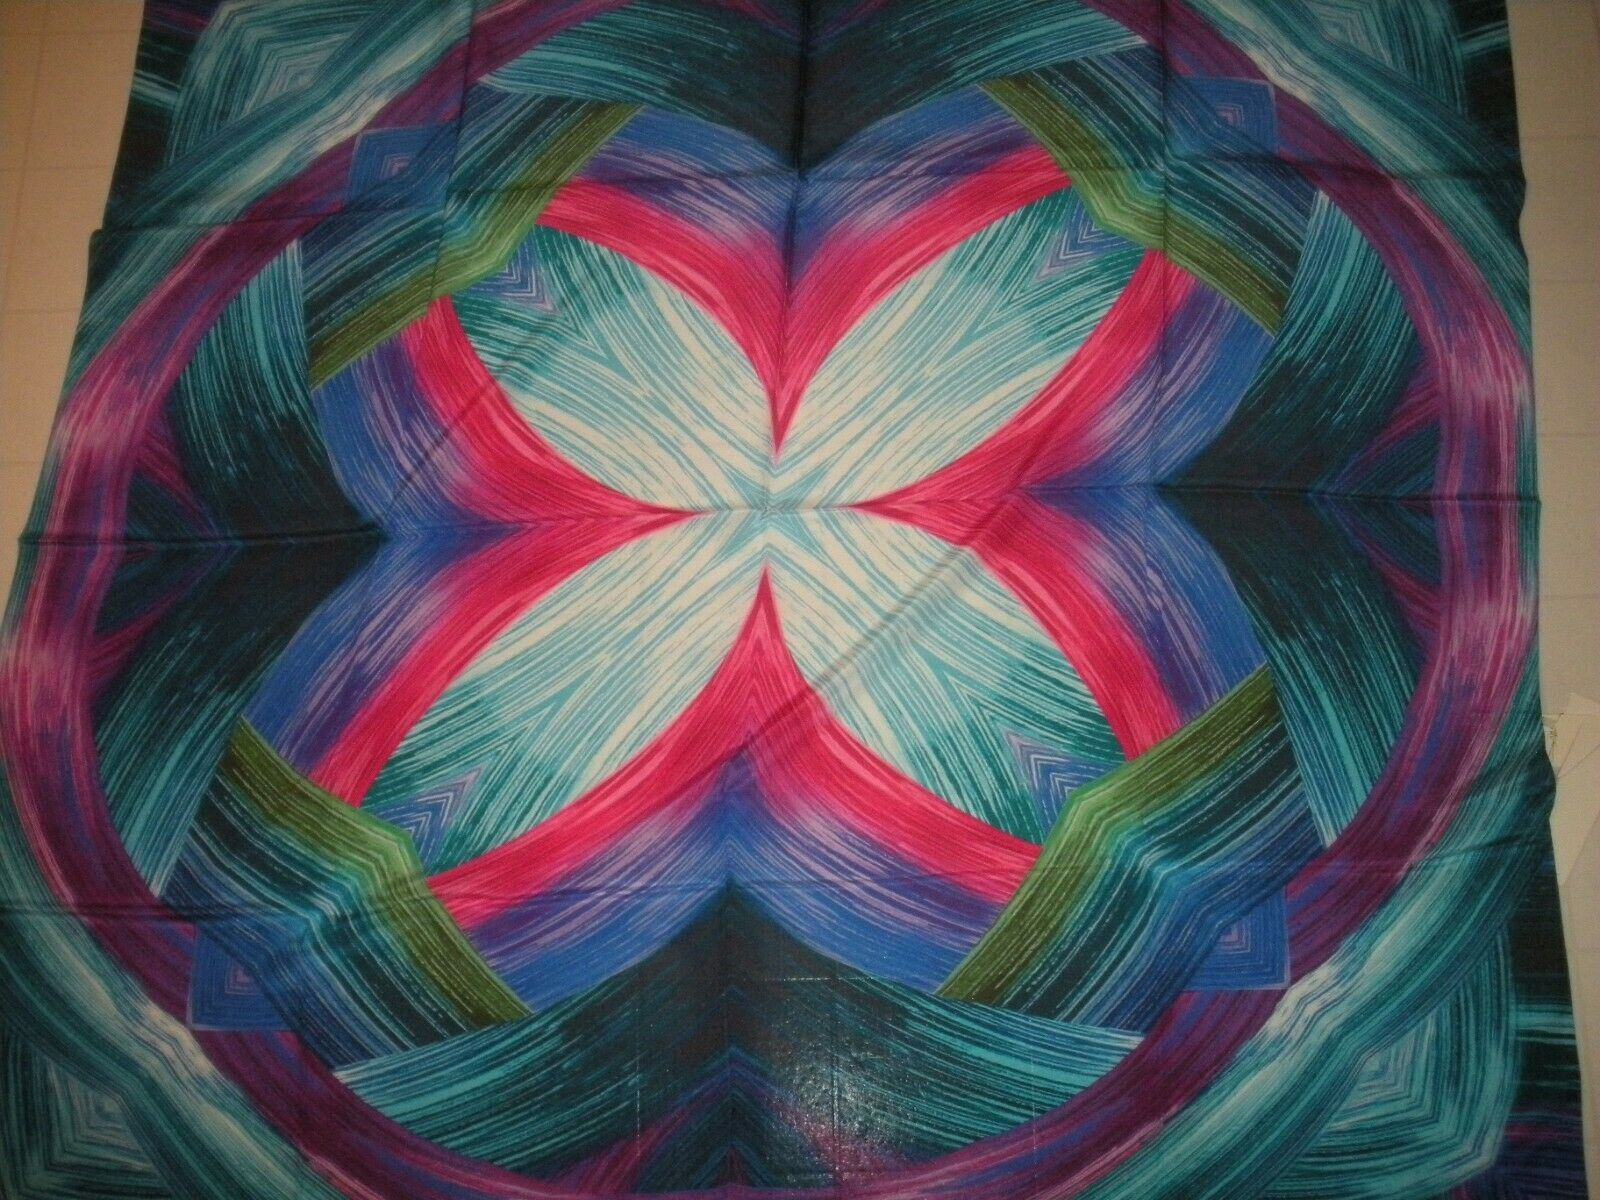 GOTTEX Multicolor Festival 100% Silk Swim Sarong Coverup Pareo One Size NWT